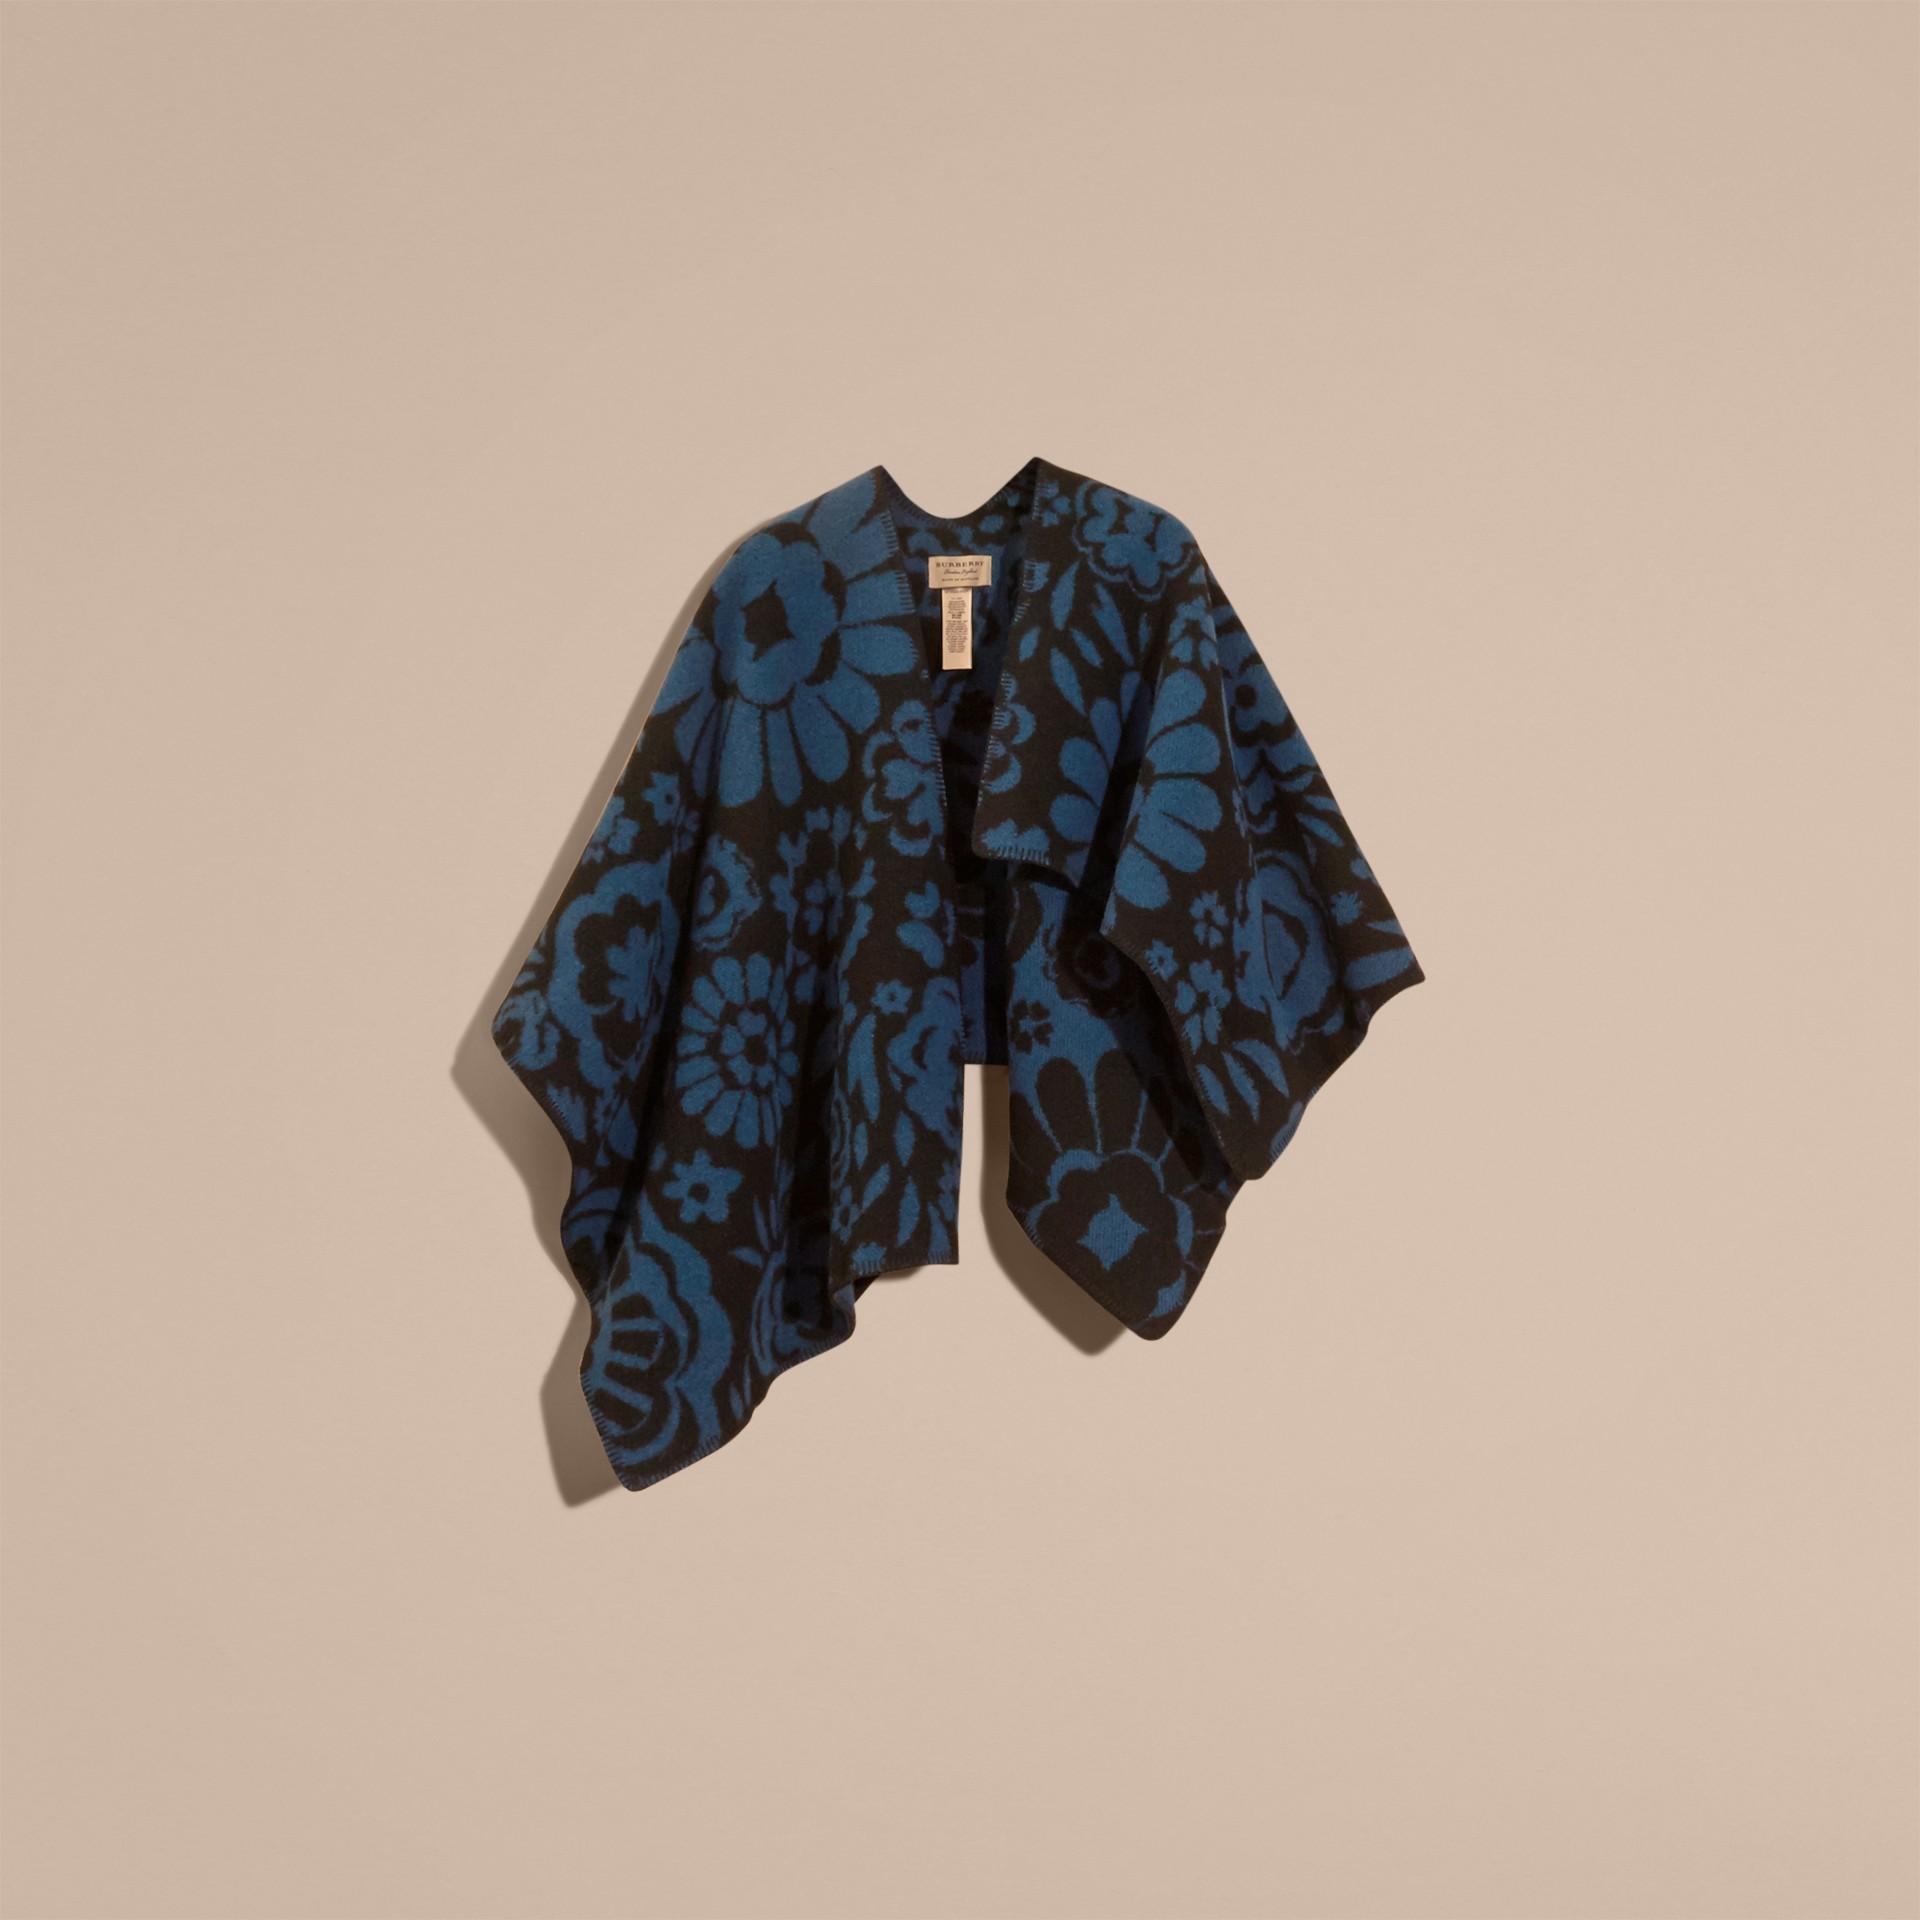 Ozeanblau Jacquard-Poncho aus Wolle und Kaschmir mit floralem Muster - Galerie-Bild 4